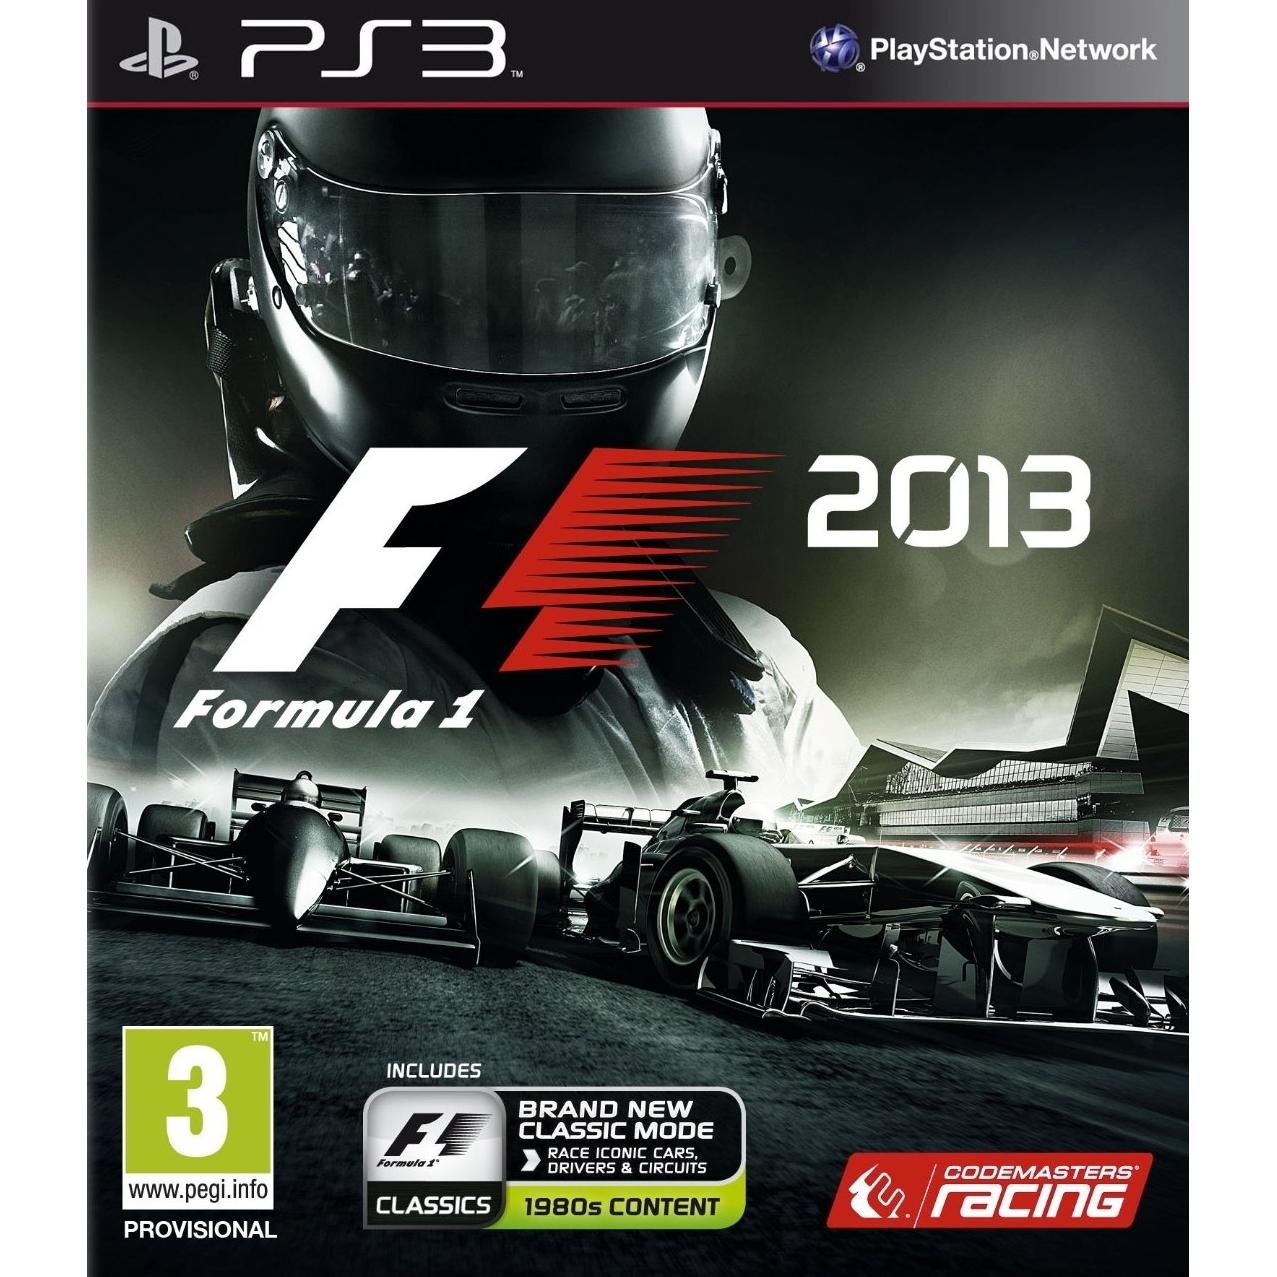 Joc Formula 1 2013 pentru PlayStation 3 0